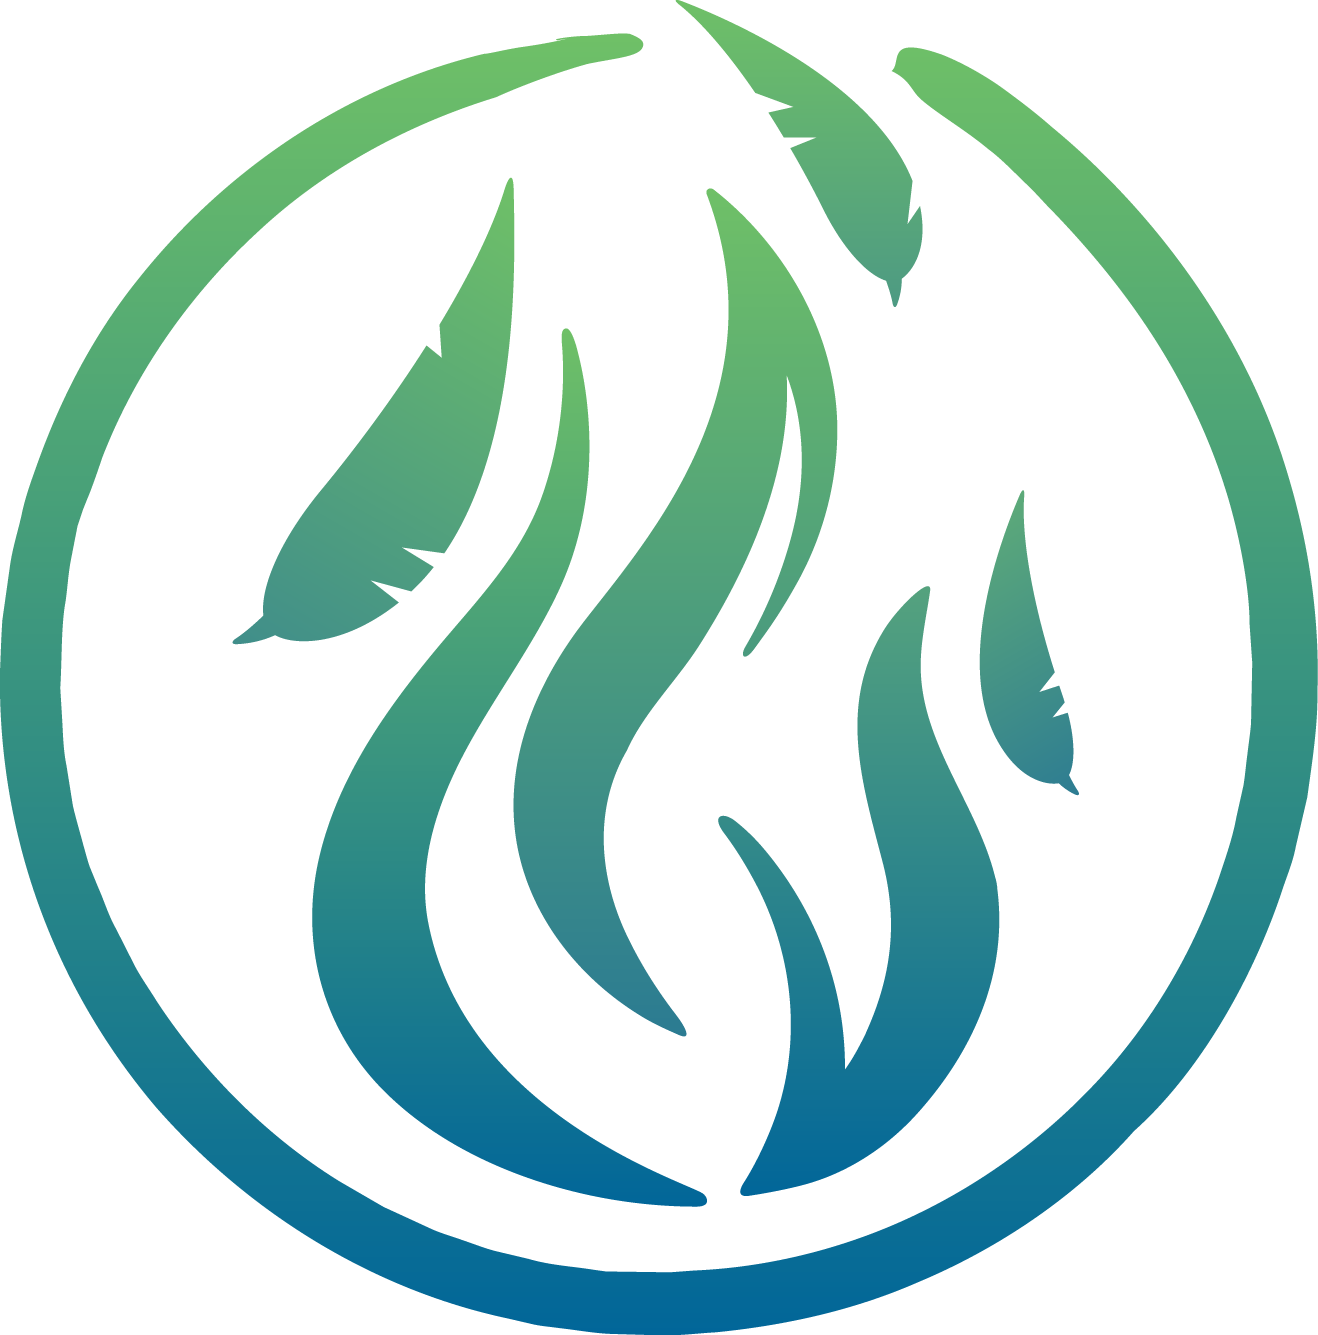 CouncilFire_icon_gradient.png